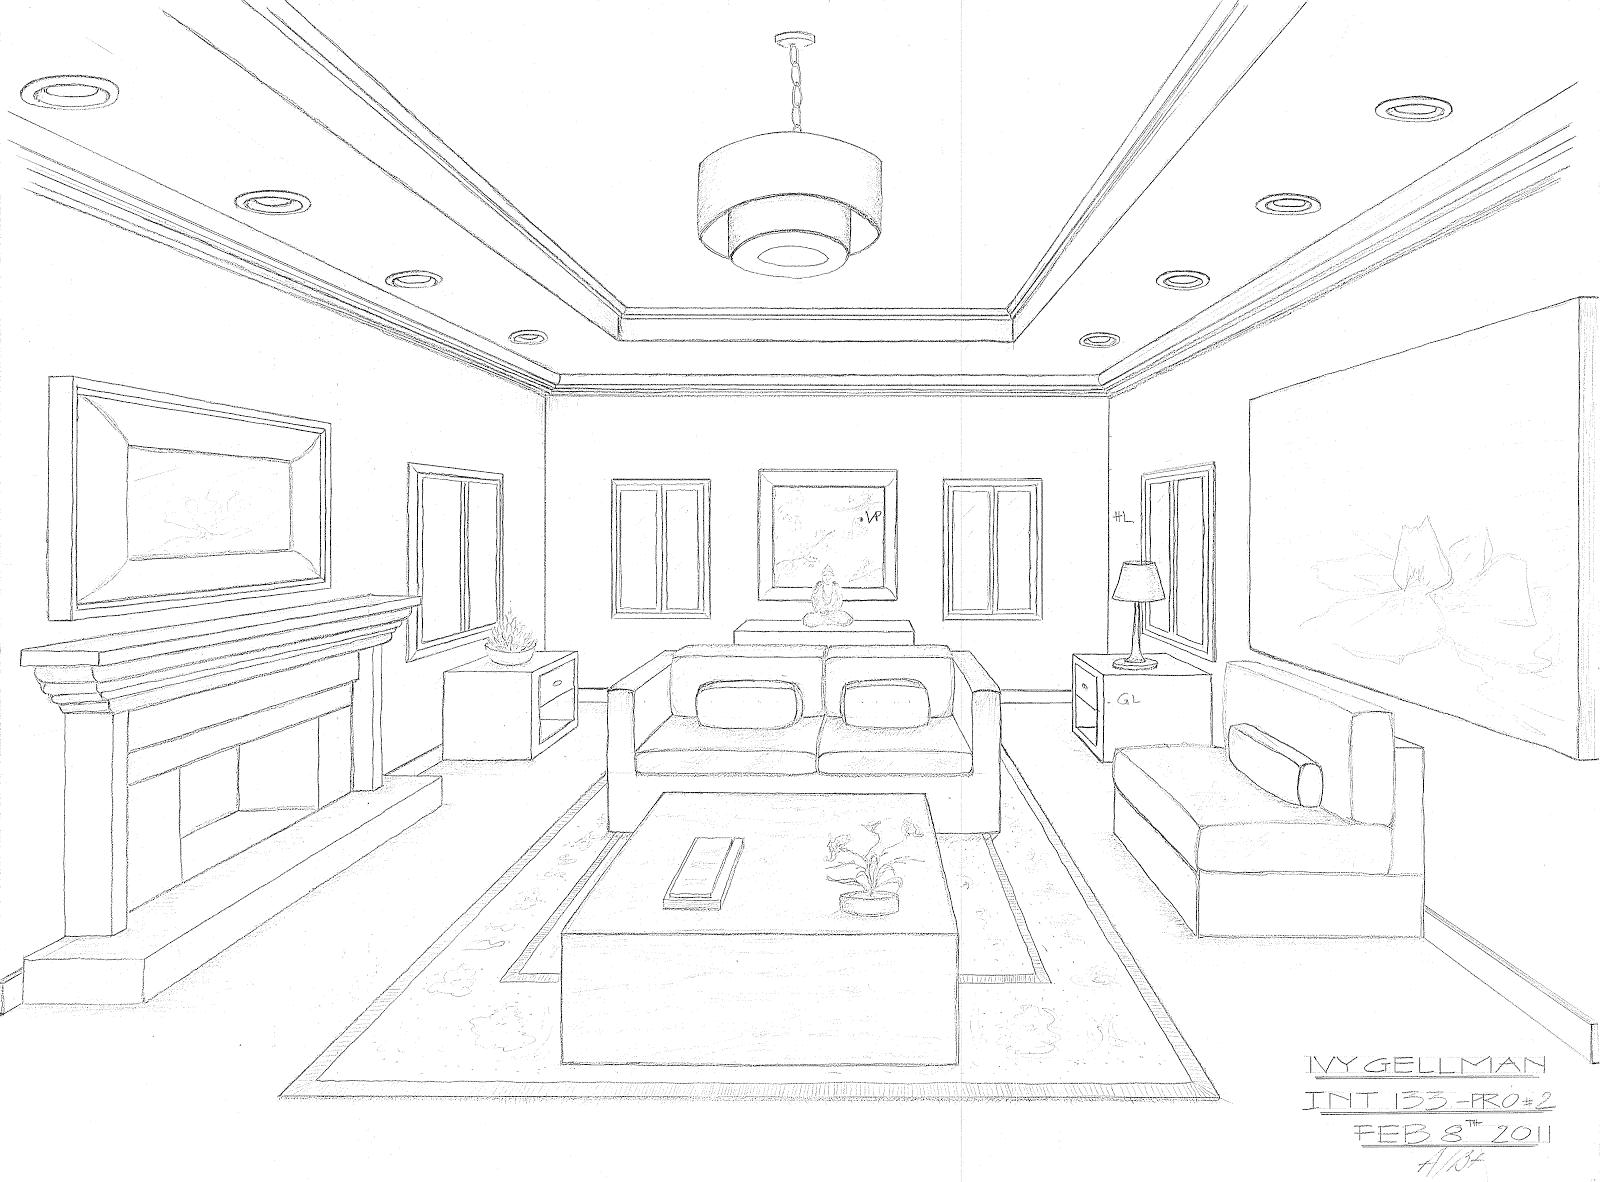 Living Room Png 1600 1182 3d Sekiller Perspektif Ic Mekan